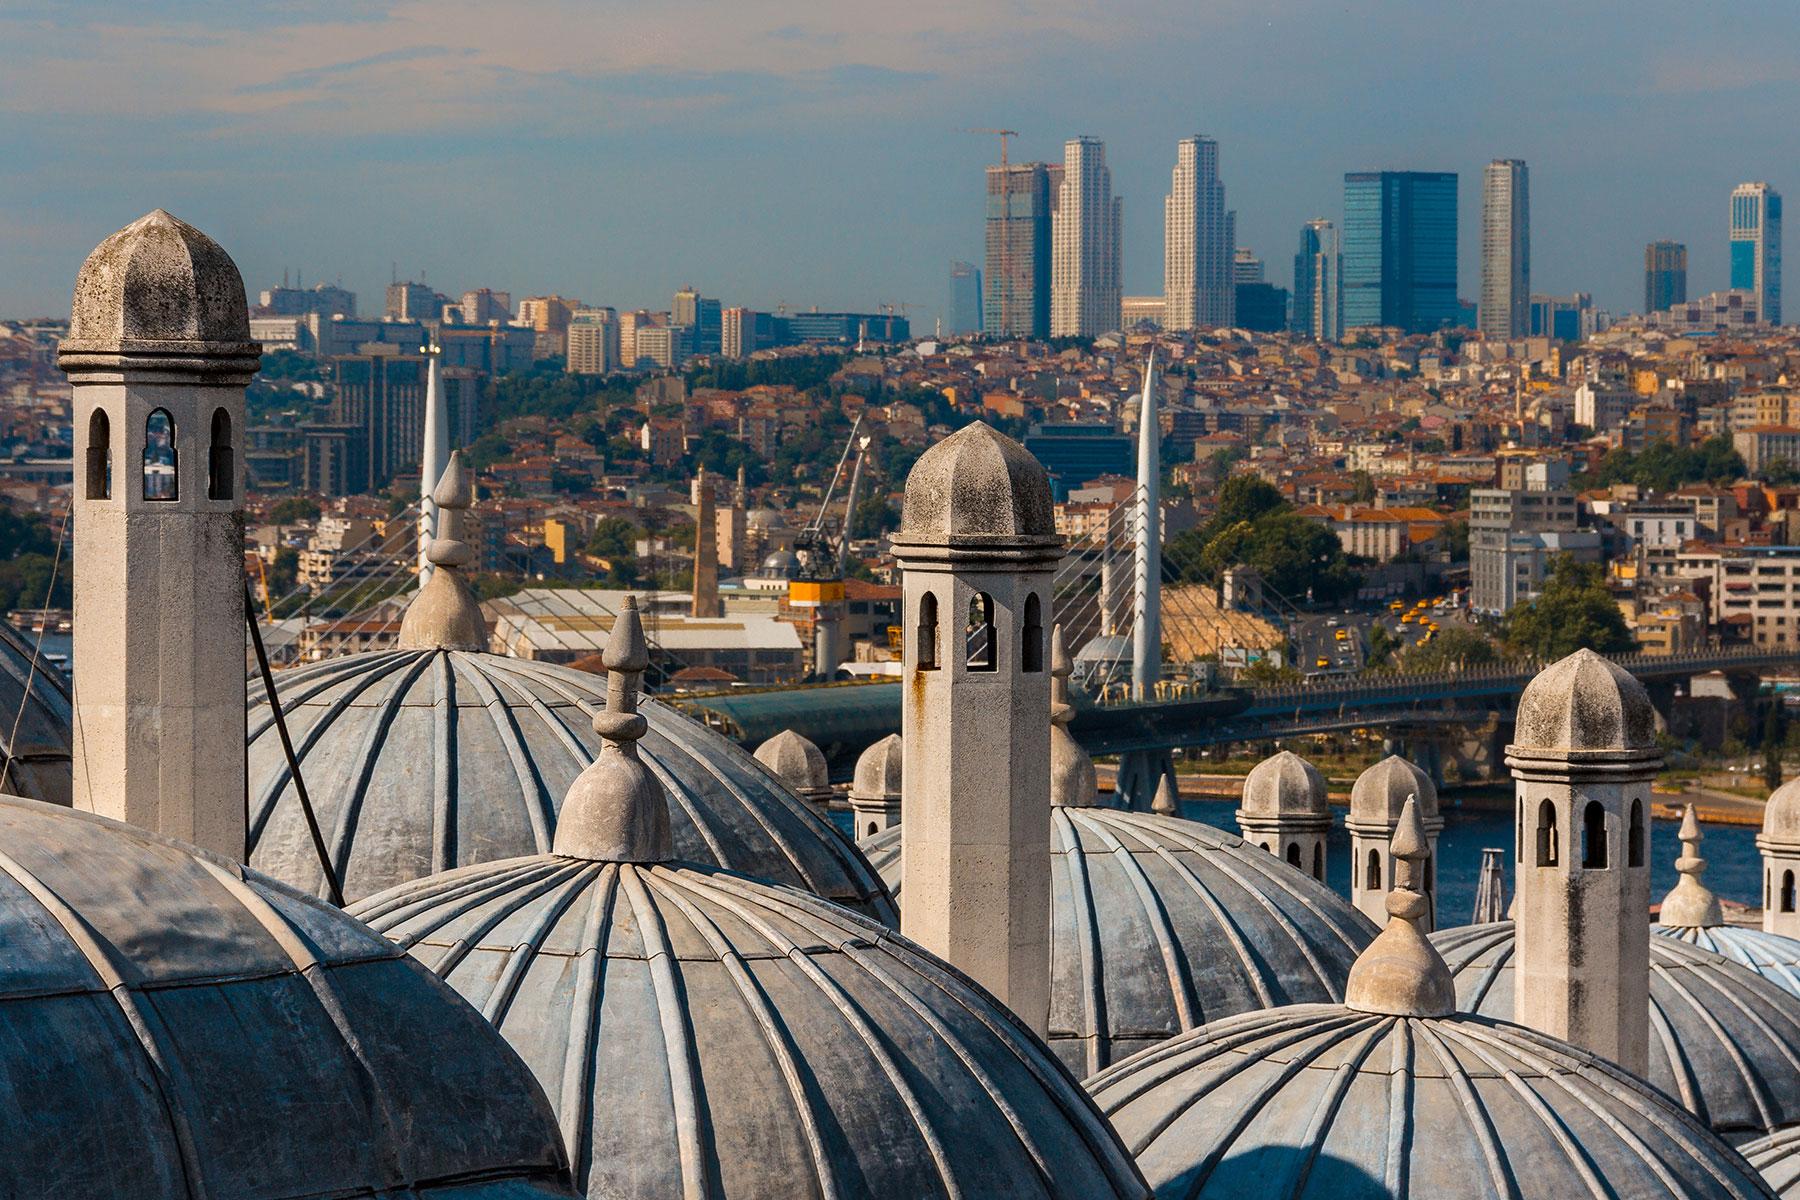 072218_Turkey_006